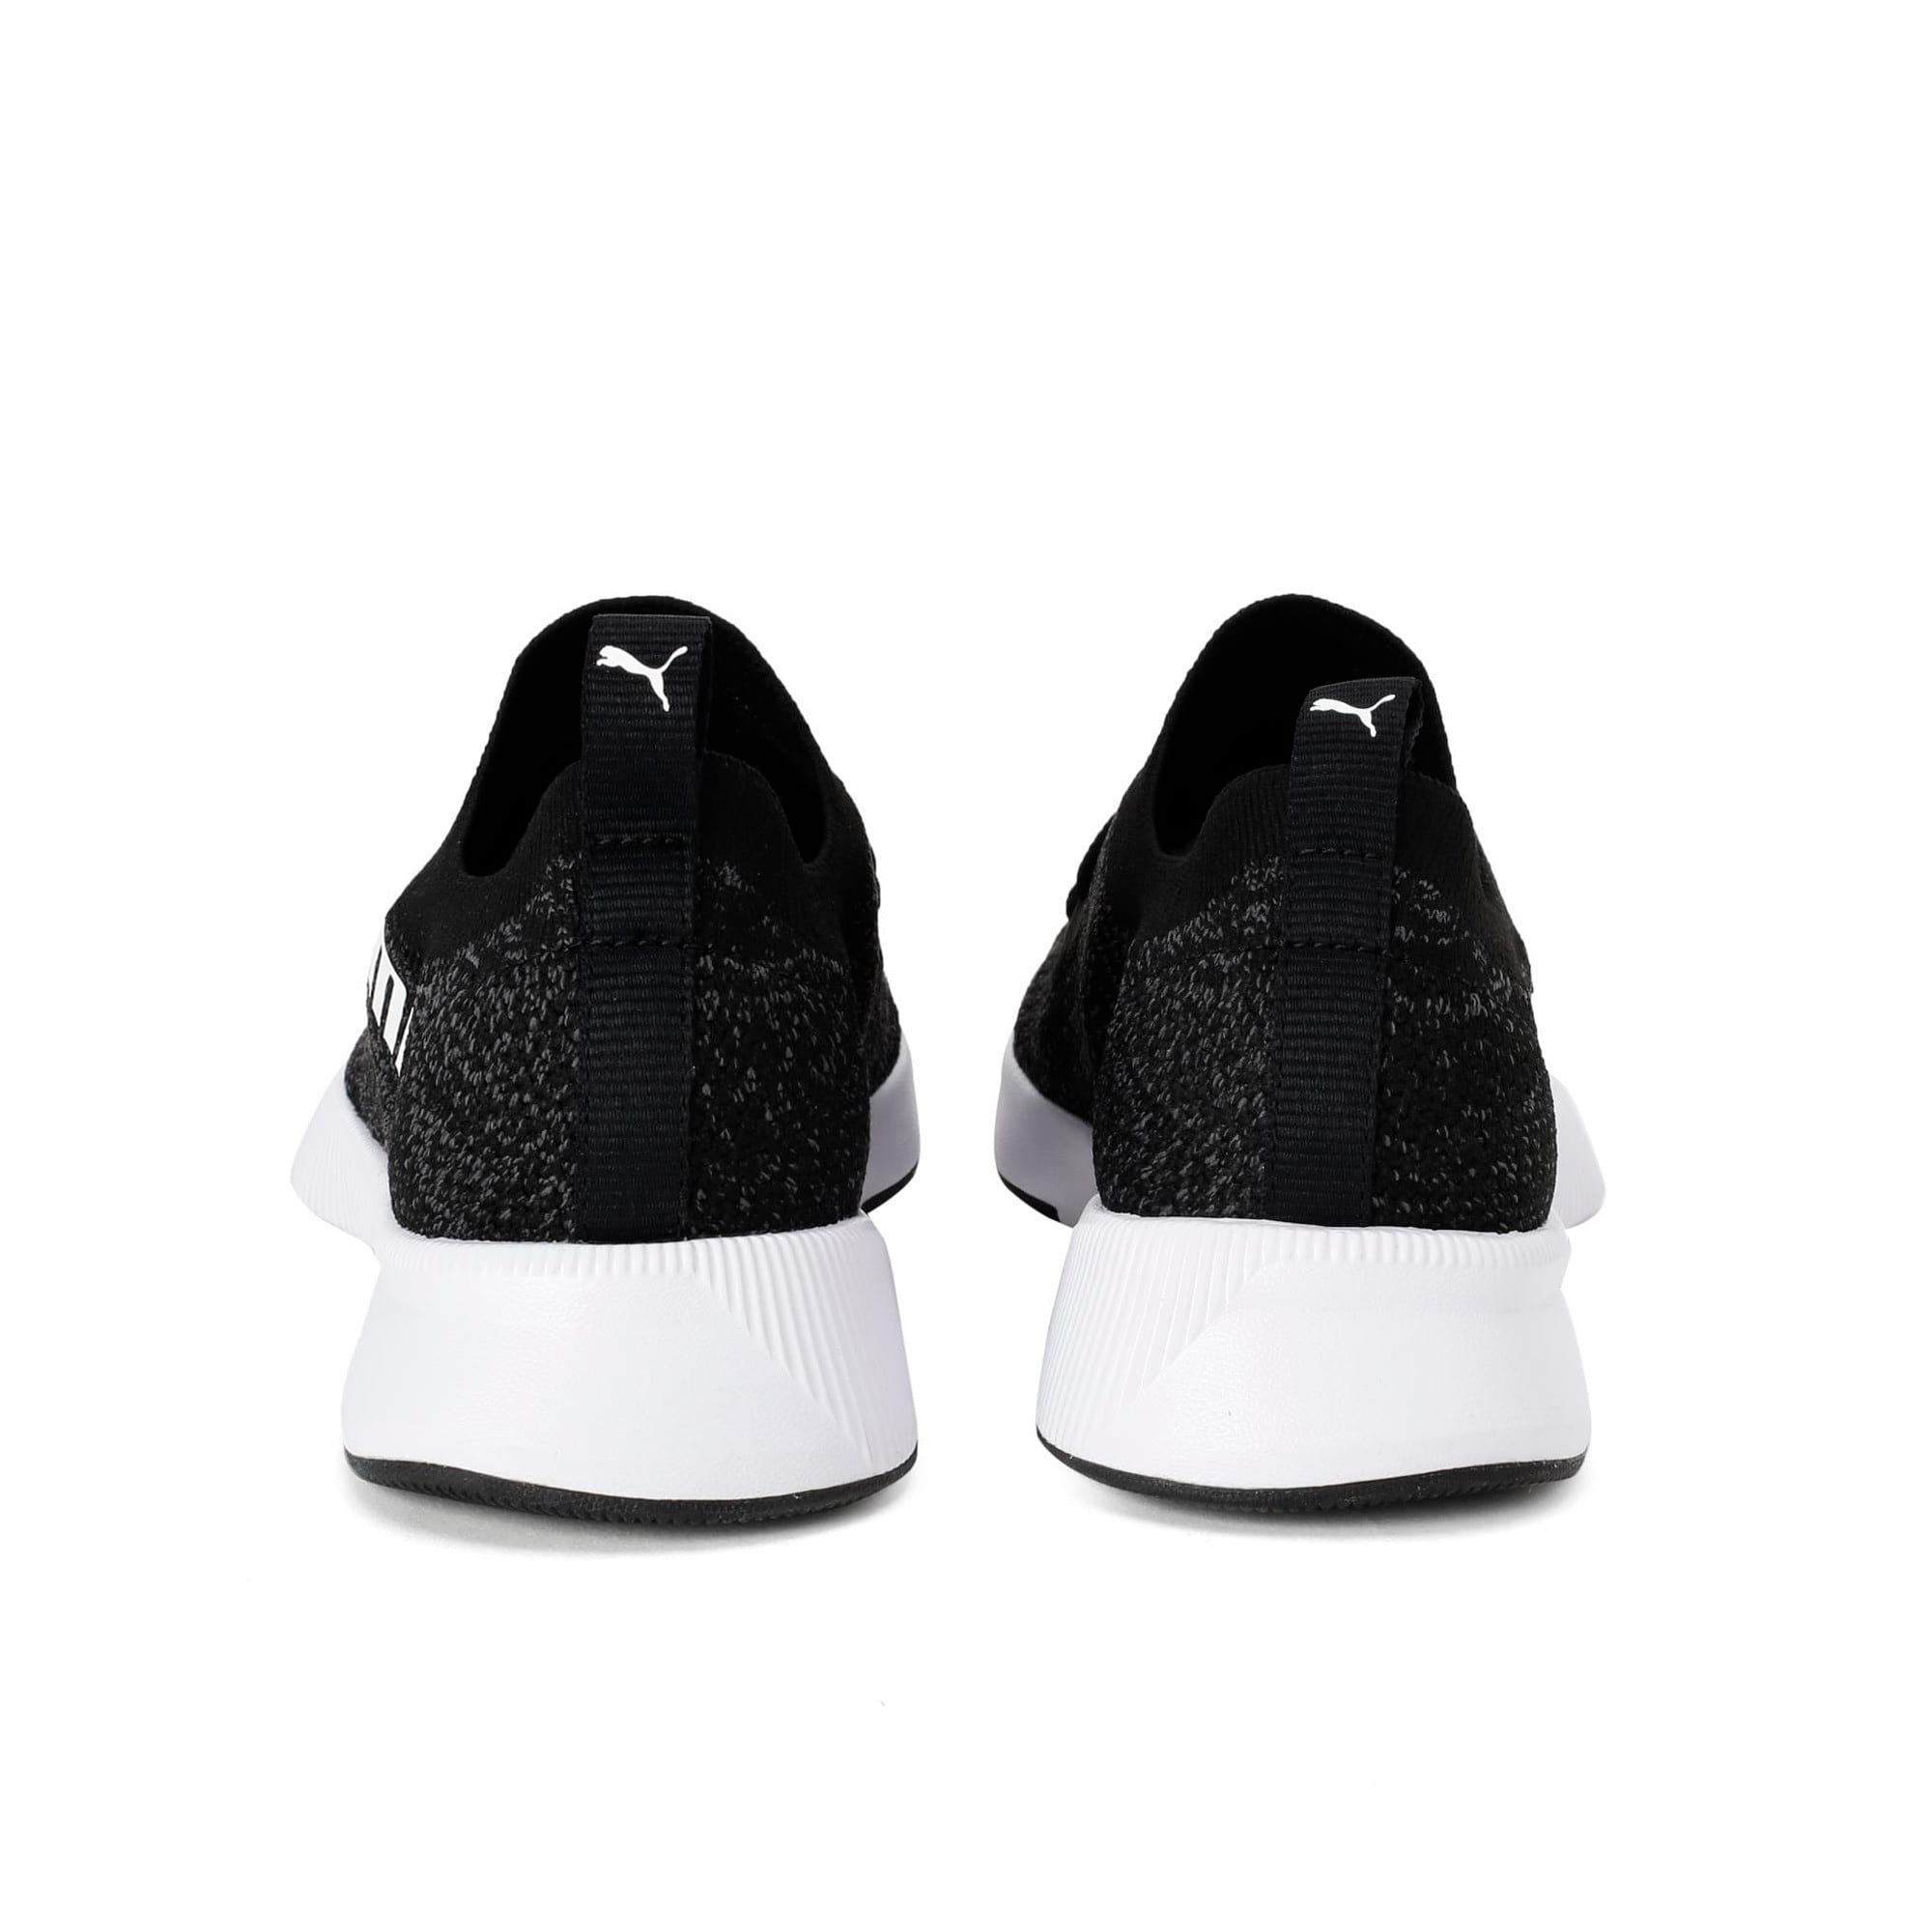 Thumbnail 2 of Flyer Women's Running Shoes, Puma Blk-Asphalt-Puma Wht, medium-IND